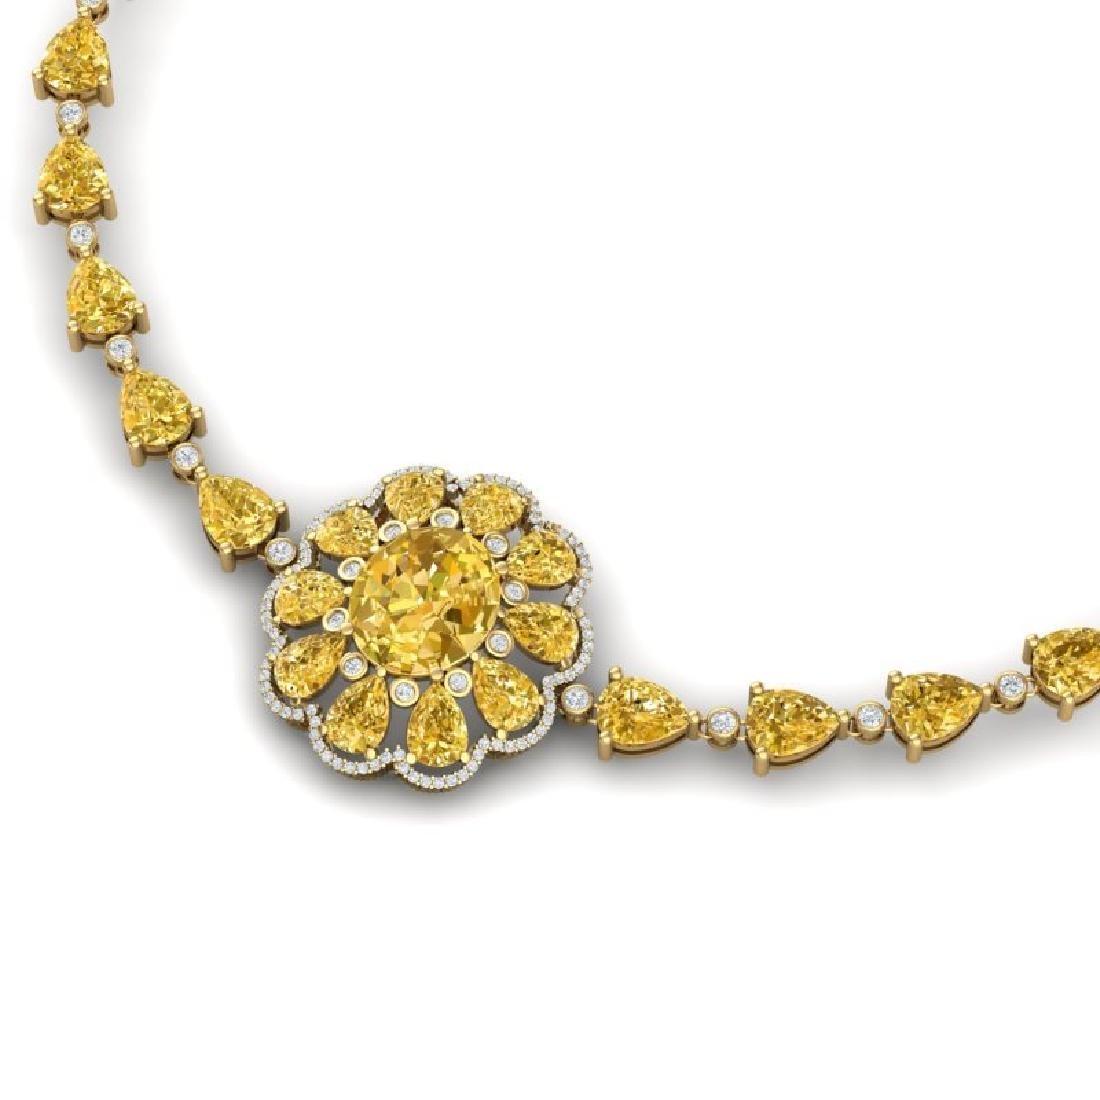 72.38 CTW Royalty Canary Citrine & VS Diamond Necklace